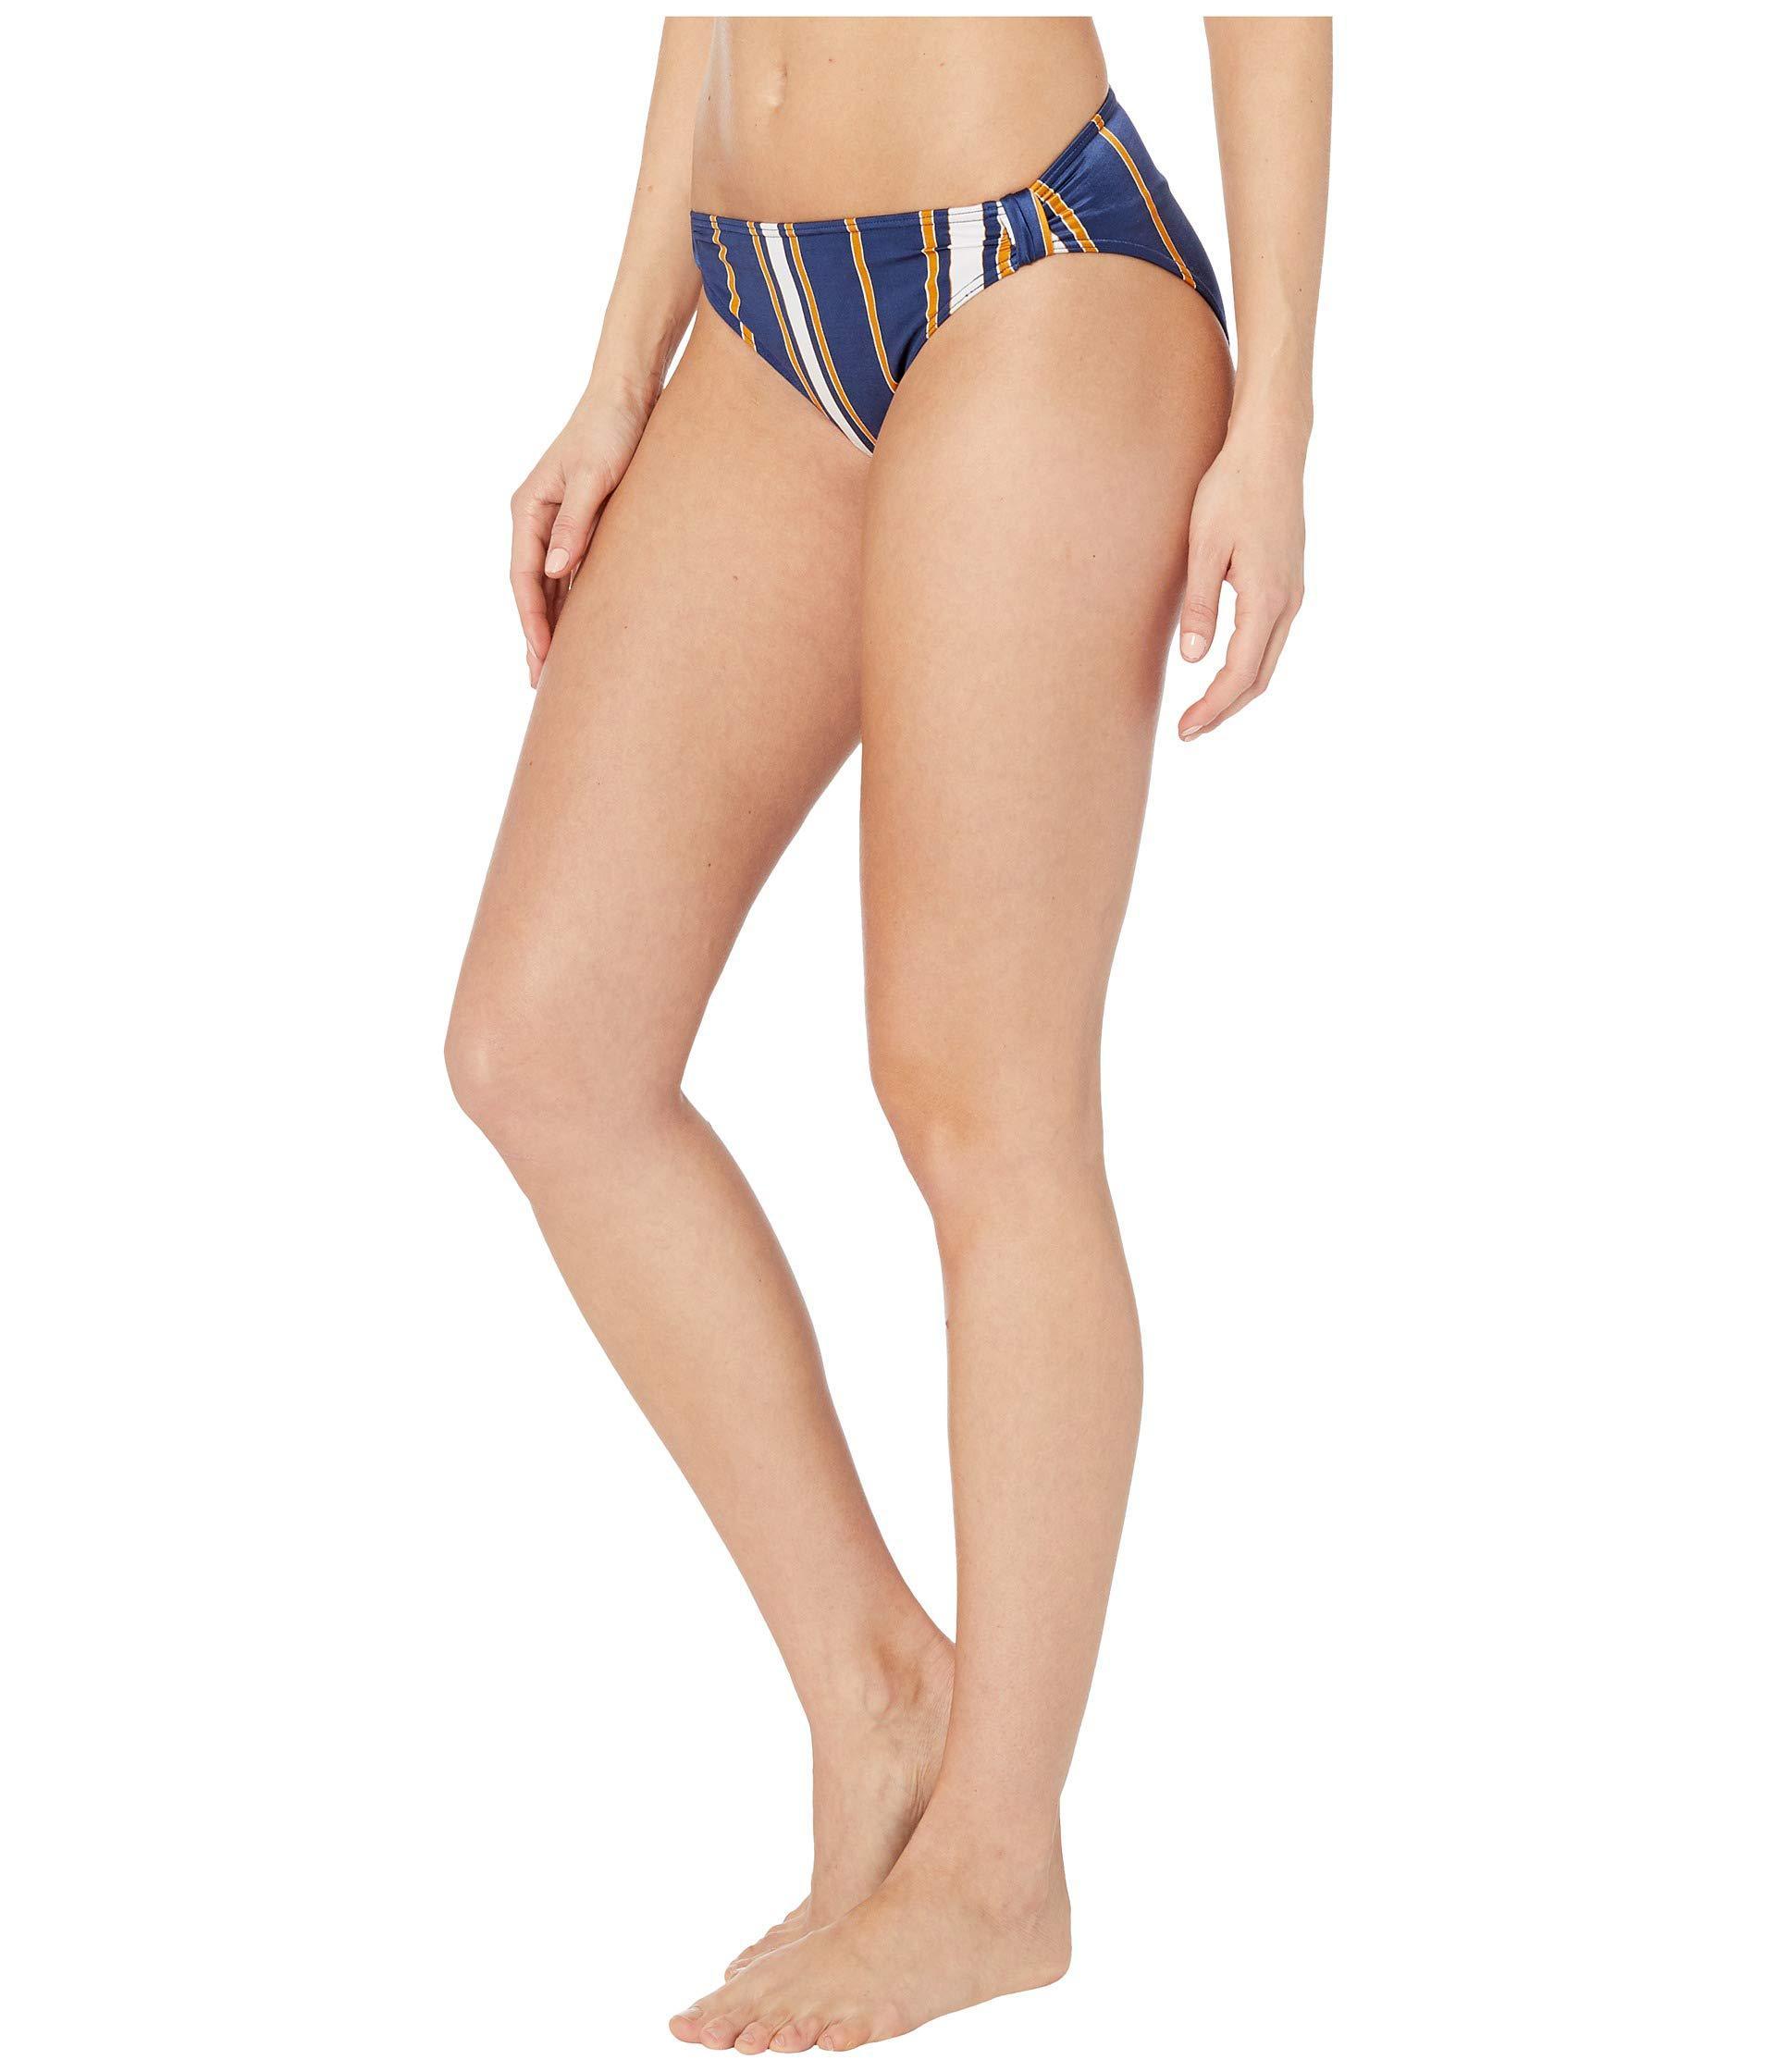 d7ed63539e Lyst - Roxy Romantic Senses Full Coverage Bikini Bottoms (medieval Blue Macy  Stripe Swim) Women s Swimwear in Blue